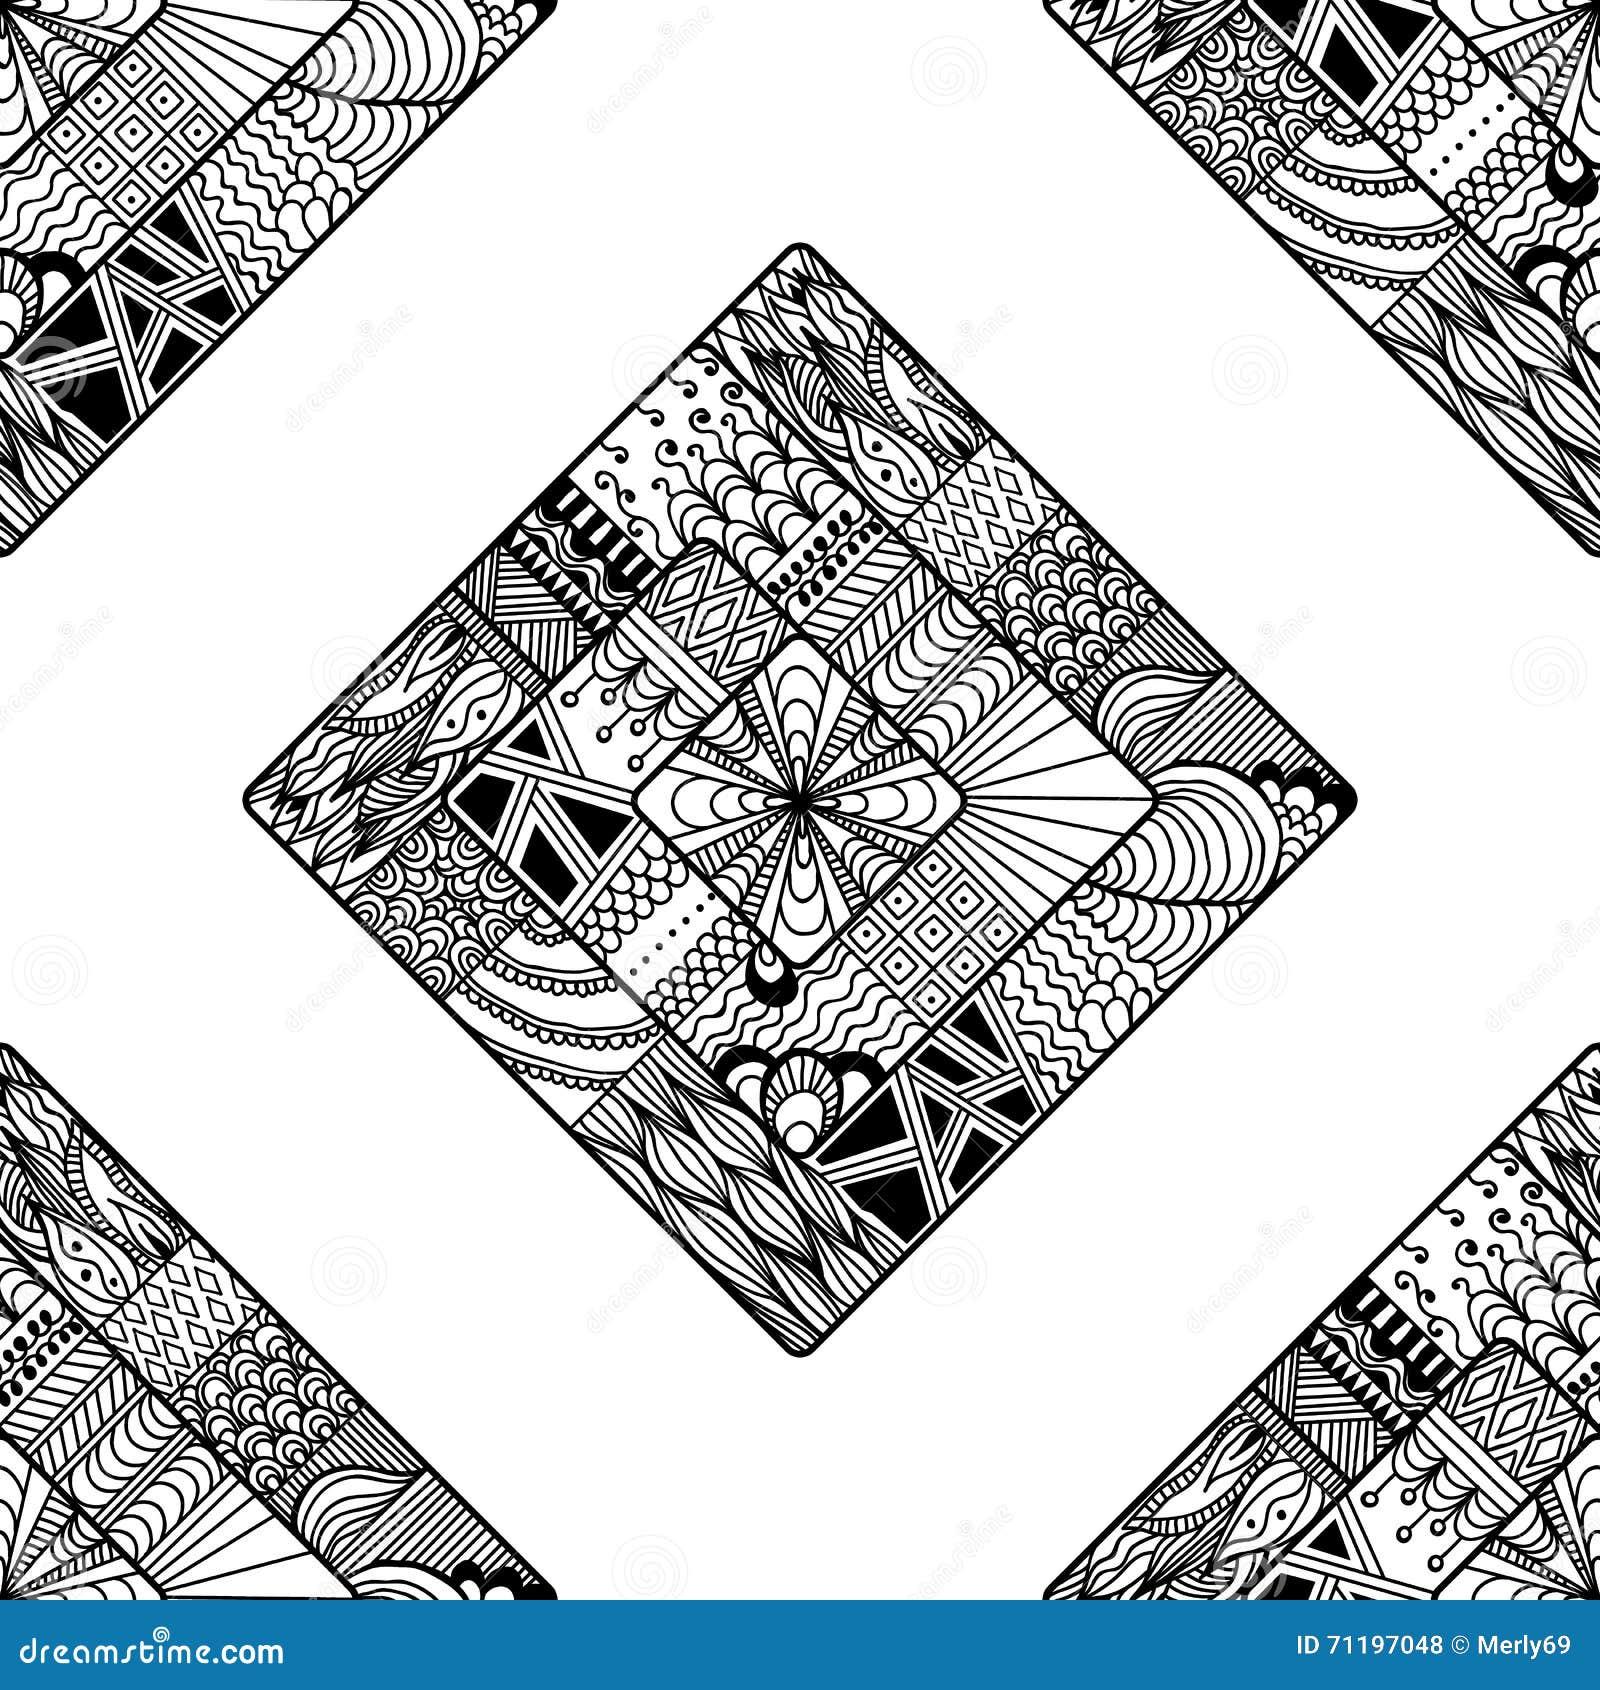 Zentangle Seamless Pattern  Doodle, Mandala  Stock Vector